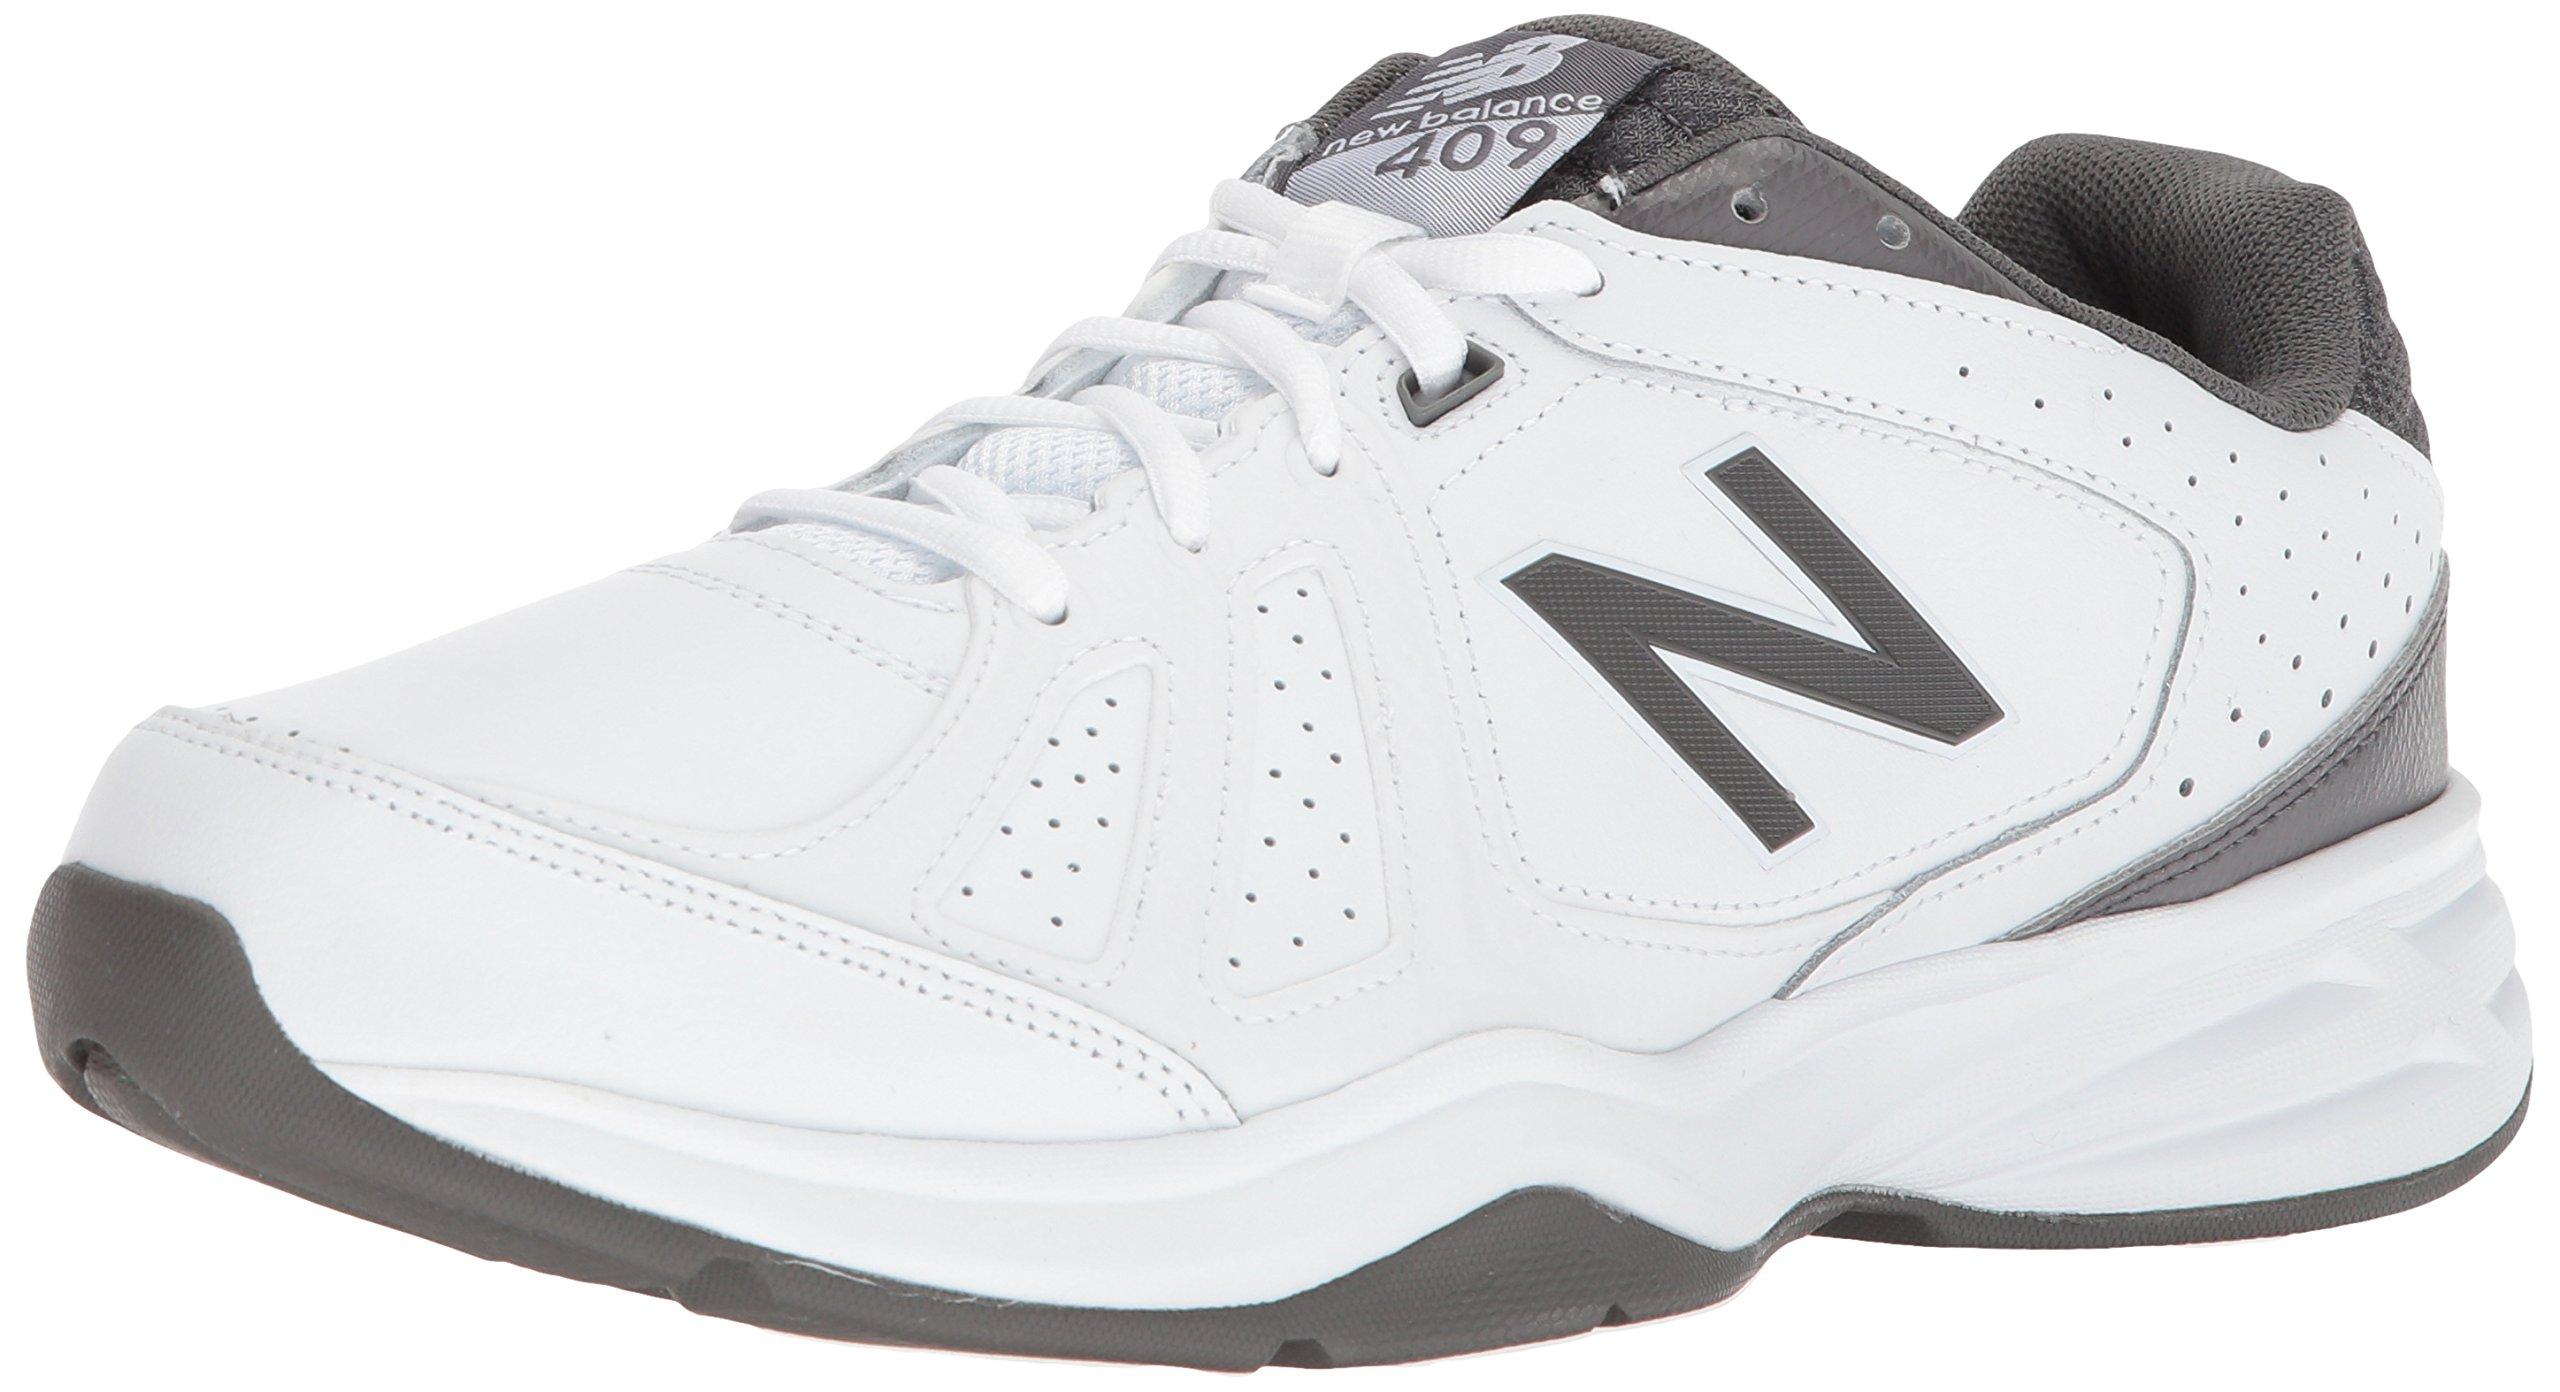 New Balance Men's mx409v3 Casual Comfort Training Shoe, White/Grey, 11 D US by New Balance